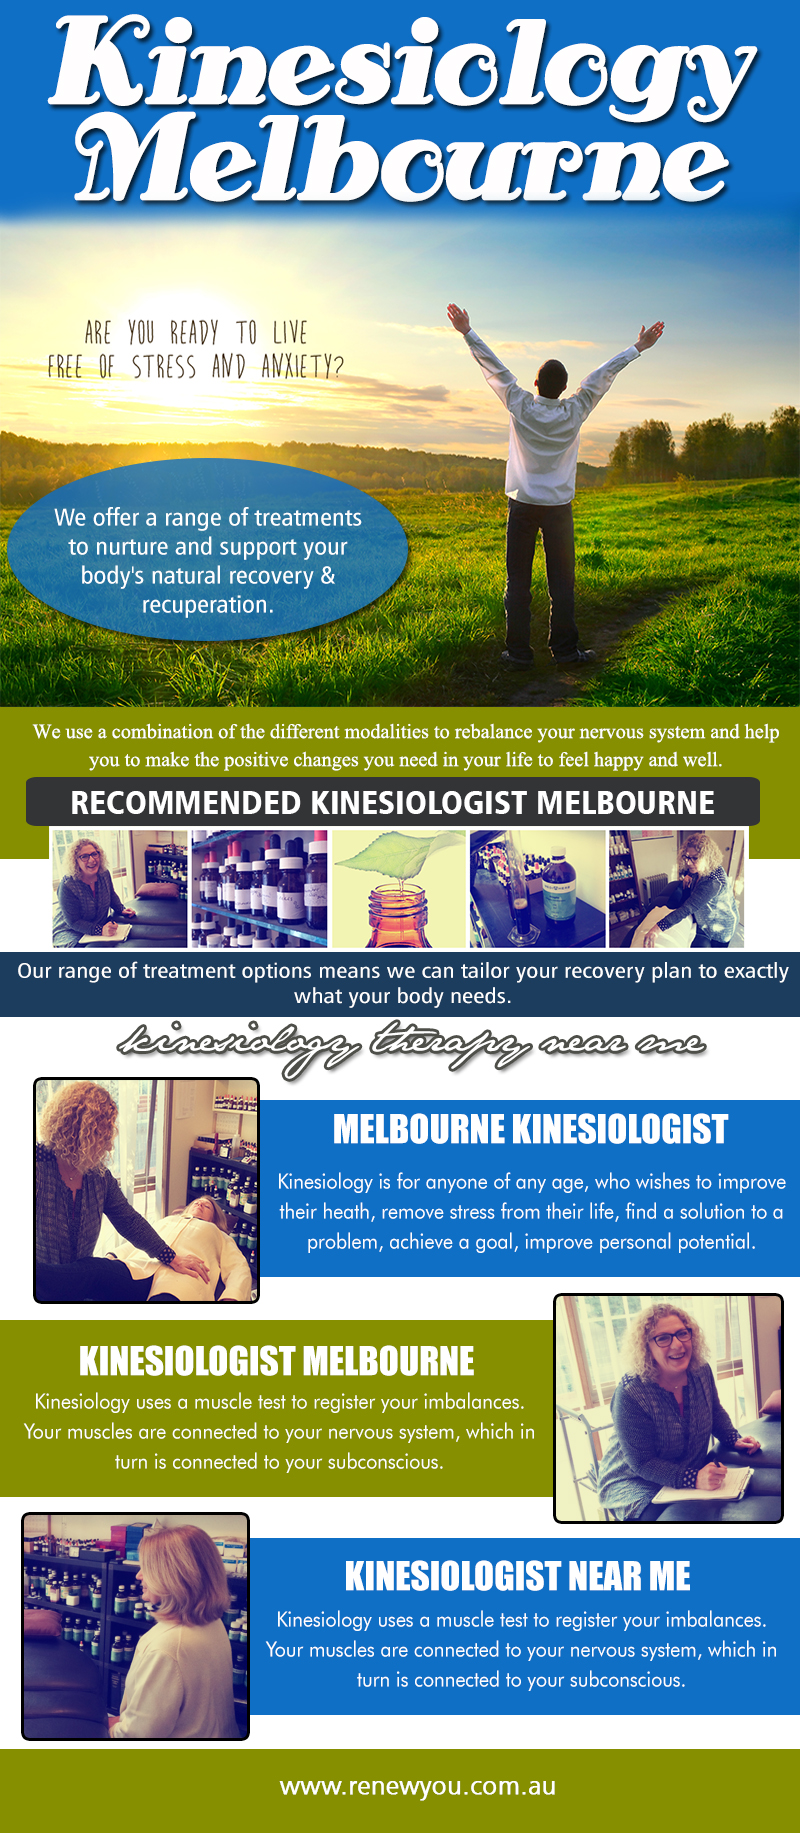 Kinesiology Melbourne.jpg